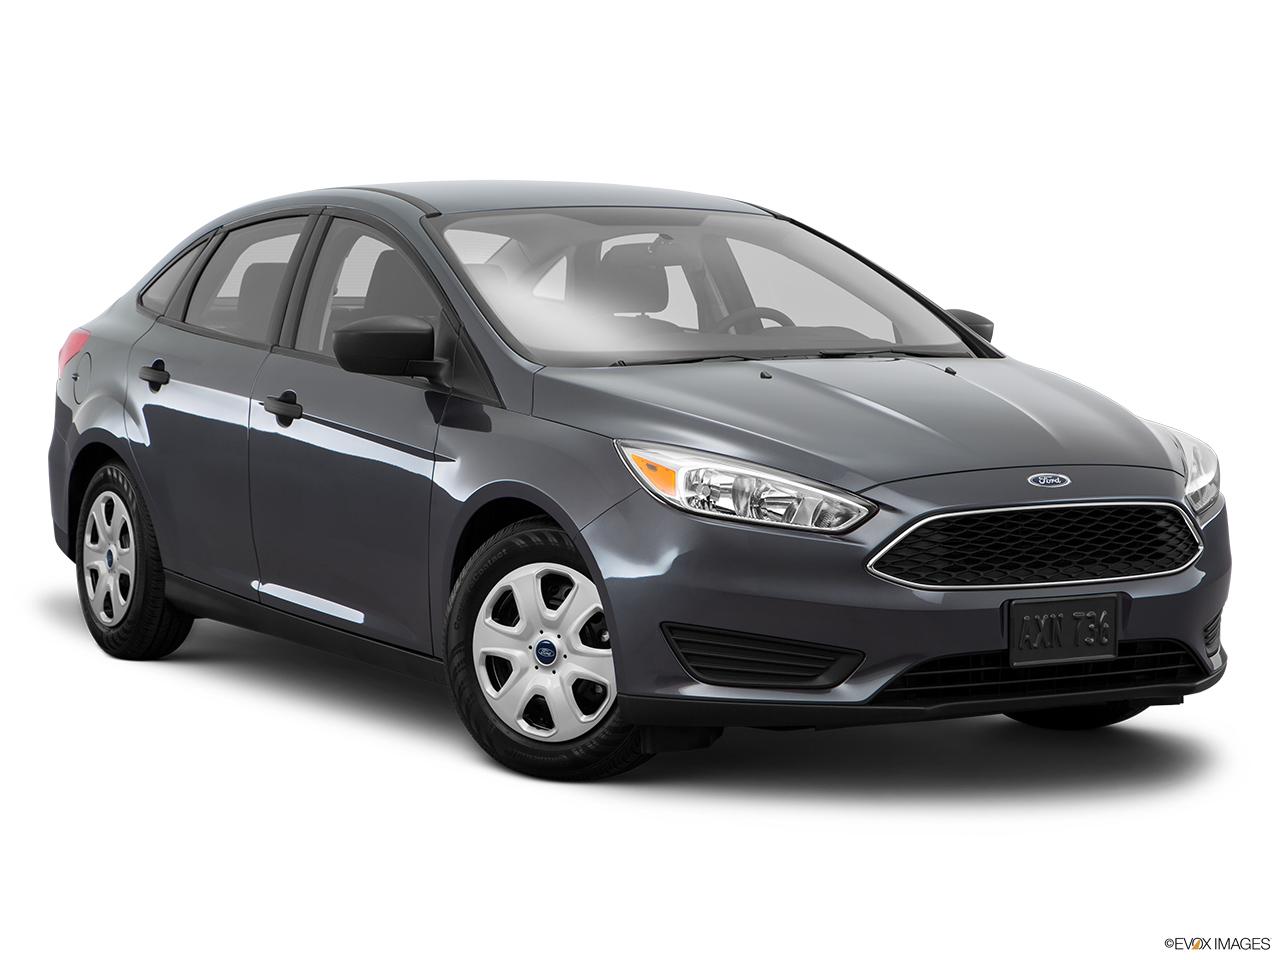 ford focus 2016 1 6l ambiente sedan in saudi arabia new car prices specs reviews photos. Black Bedroom Furniture Sets. Home Design Ideas